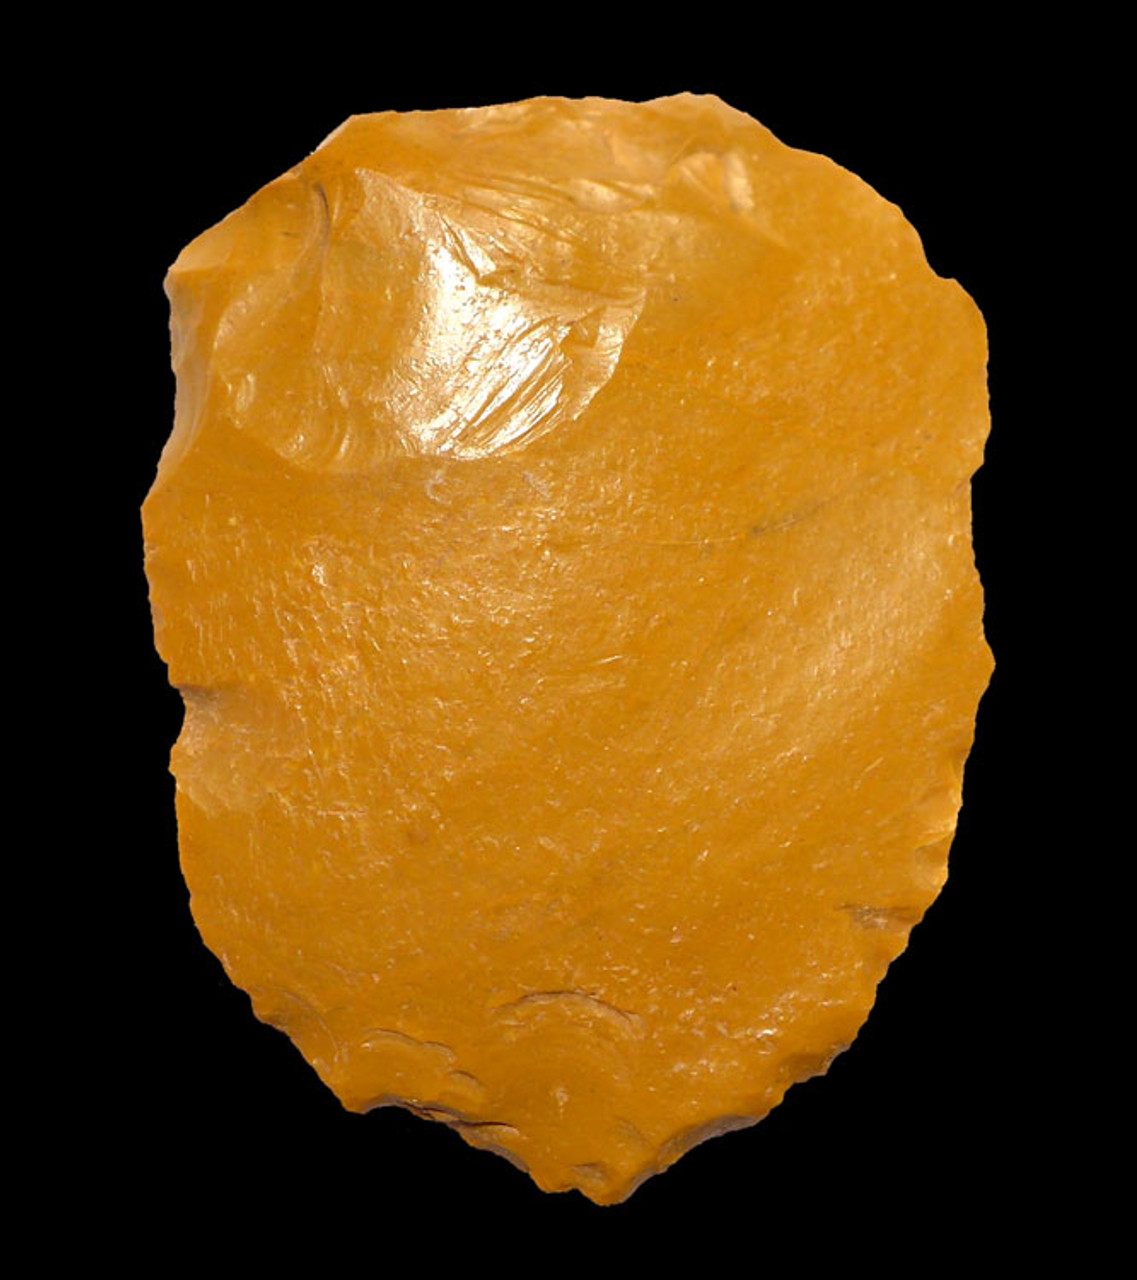 Sutes That Are Yellow: NEANDERTHAL FONTMAURE JASPER PRESTIGE ARTIFACTS